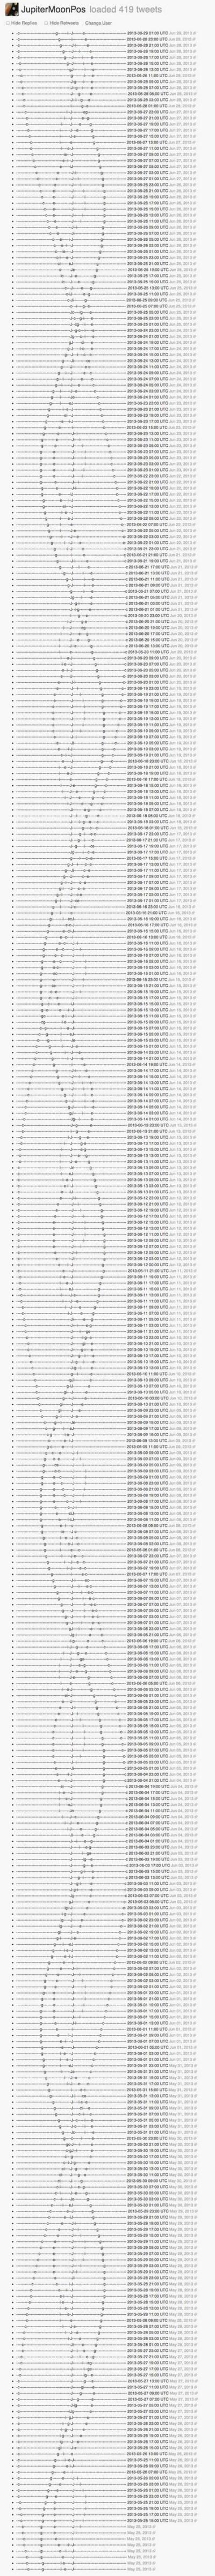 lunes-de-jupiter-onde-sinusoidale-2